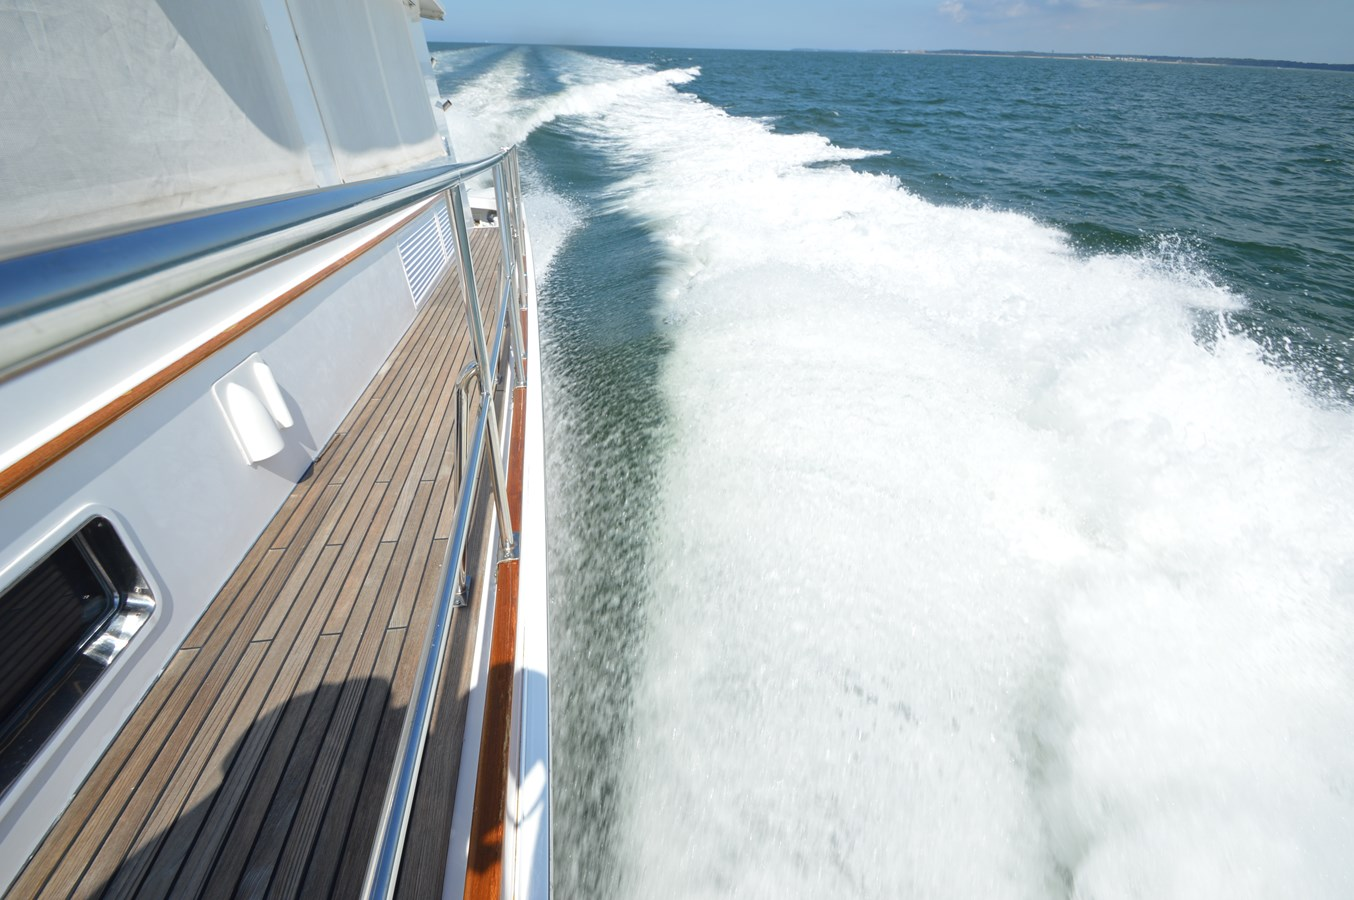 15 2004 GRAND BANKS 58 Eastbay Motor Yacht 2713671